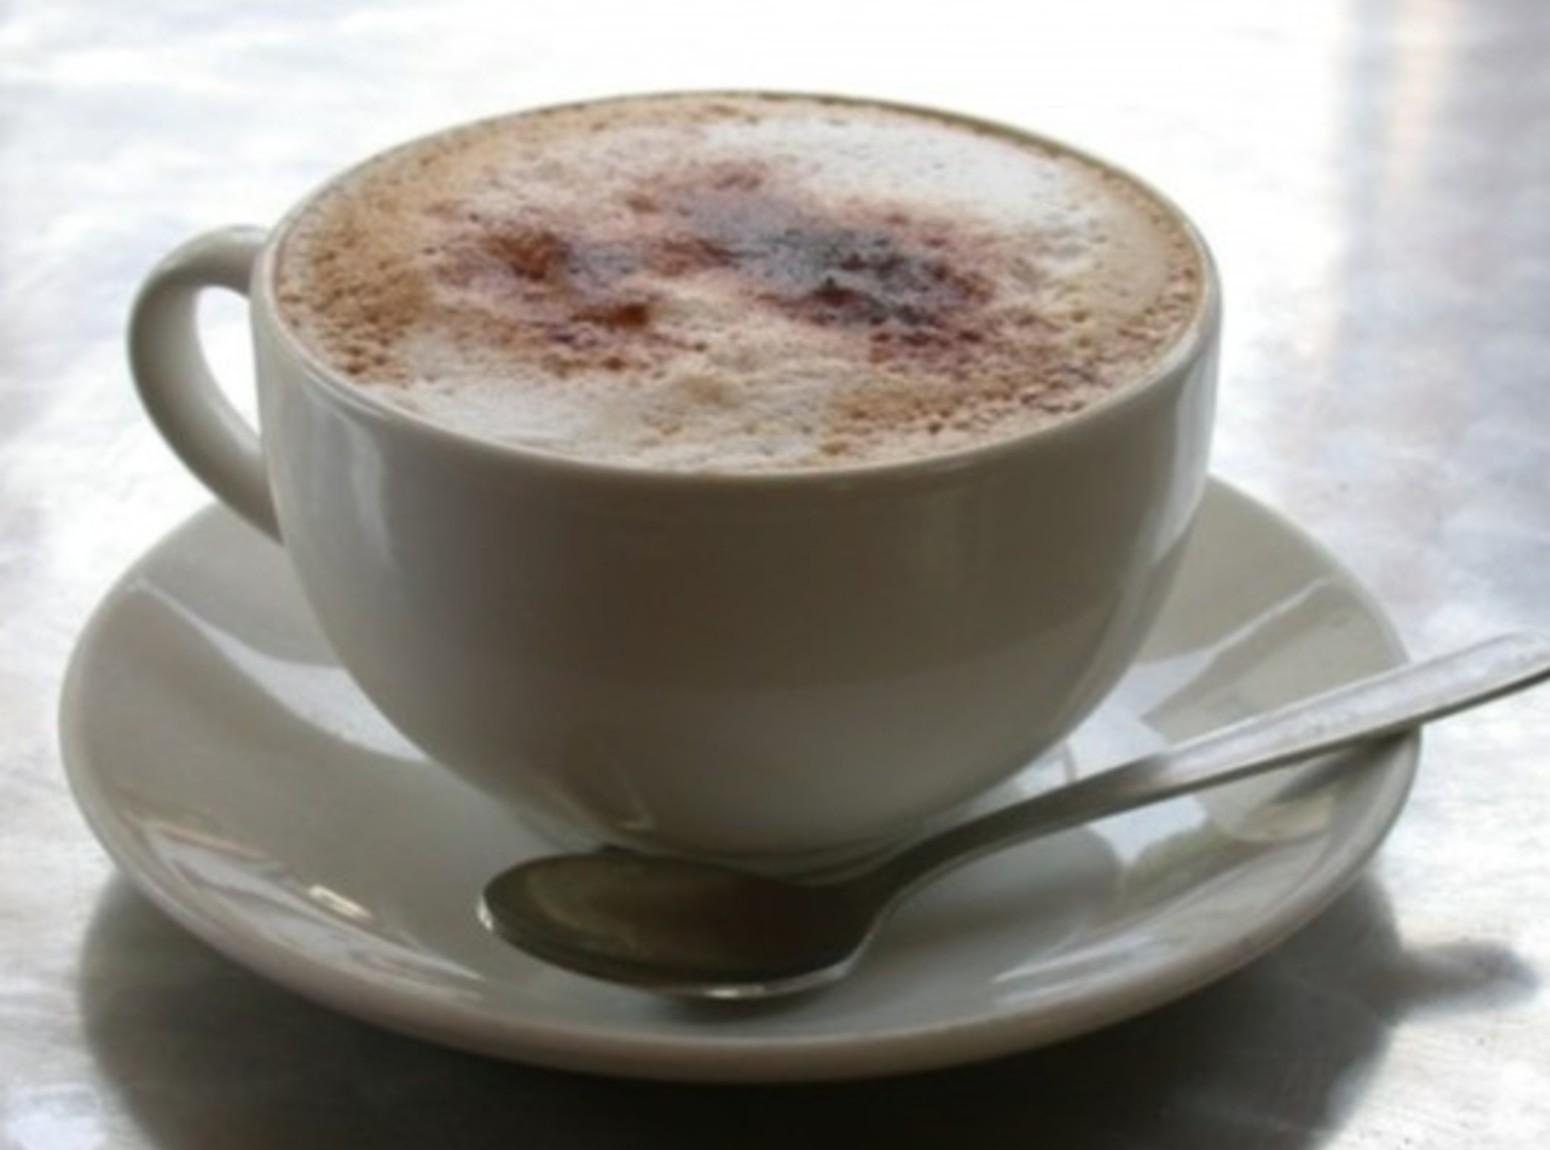 Jane Louise's Sugar-Free Cappuccino